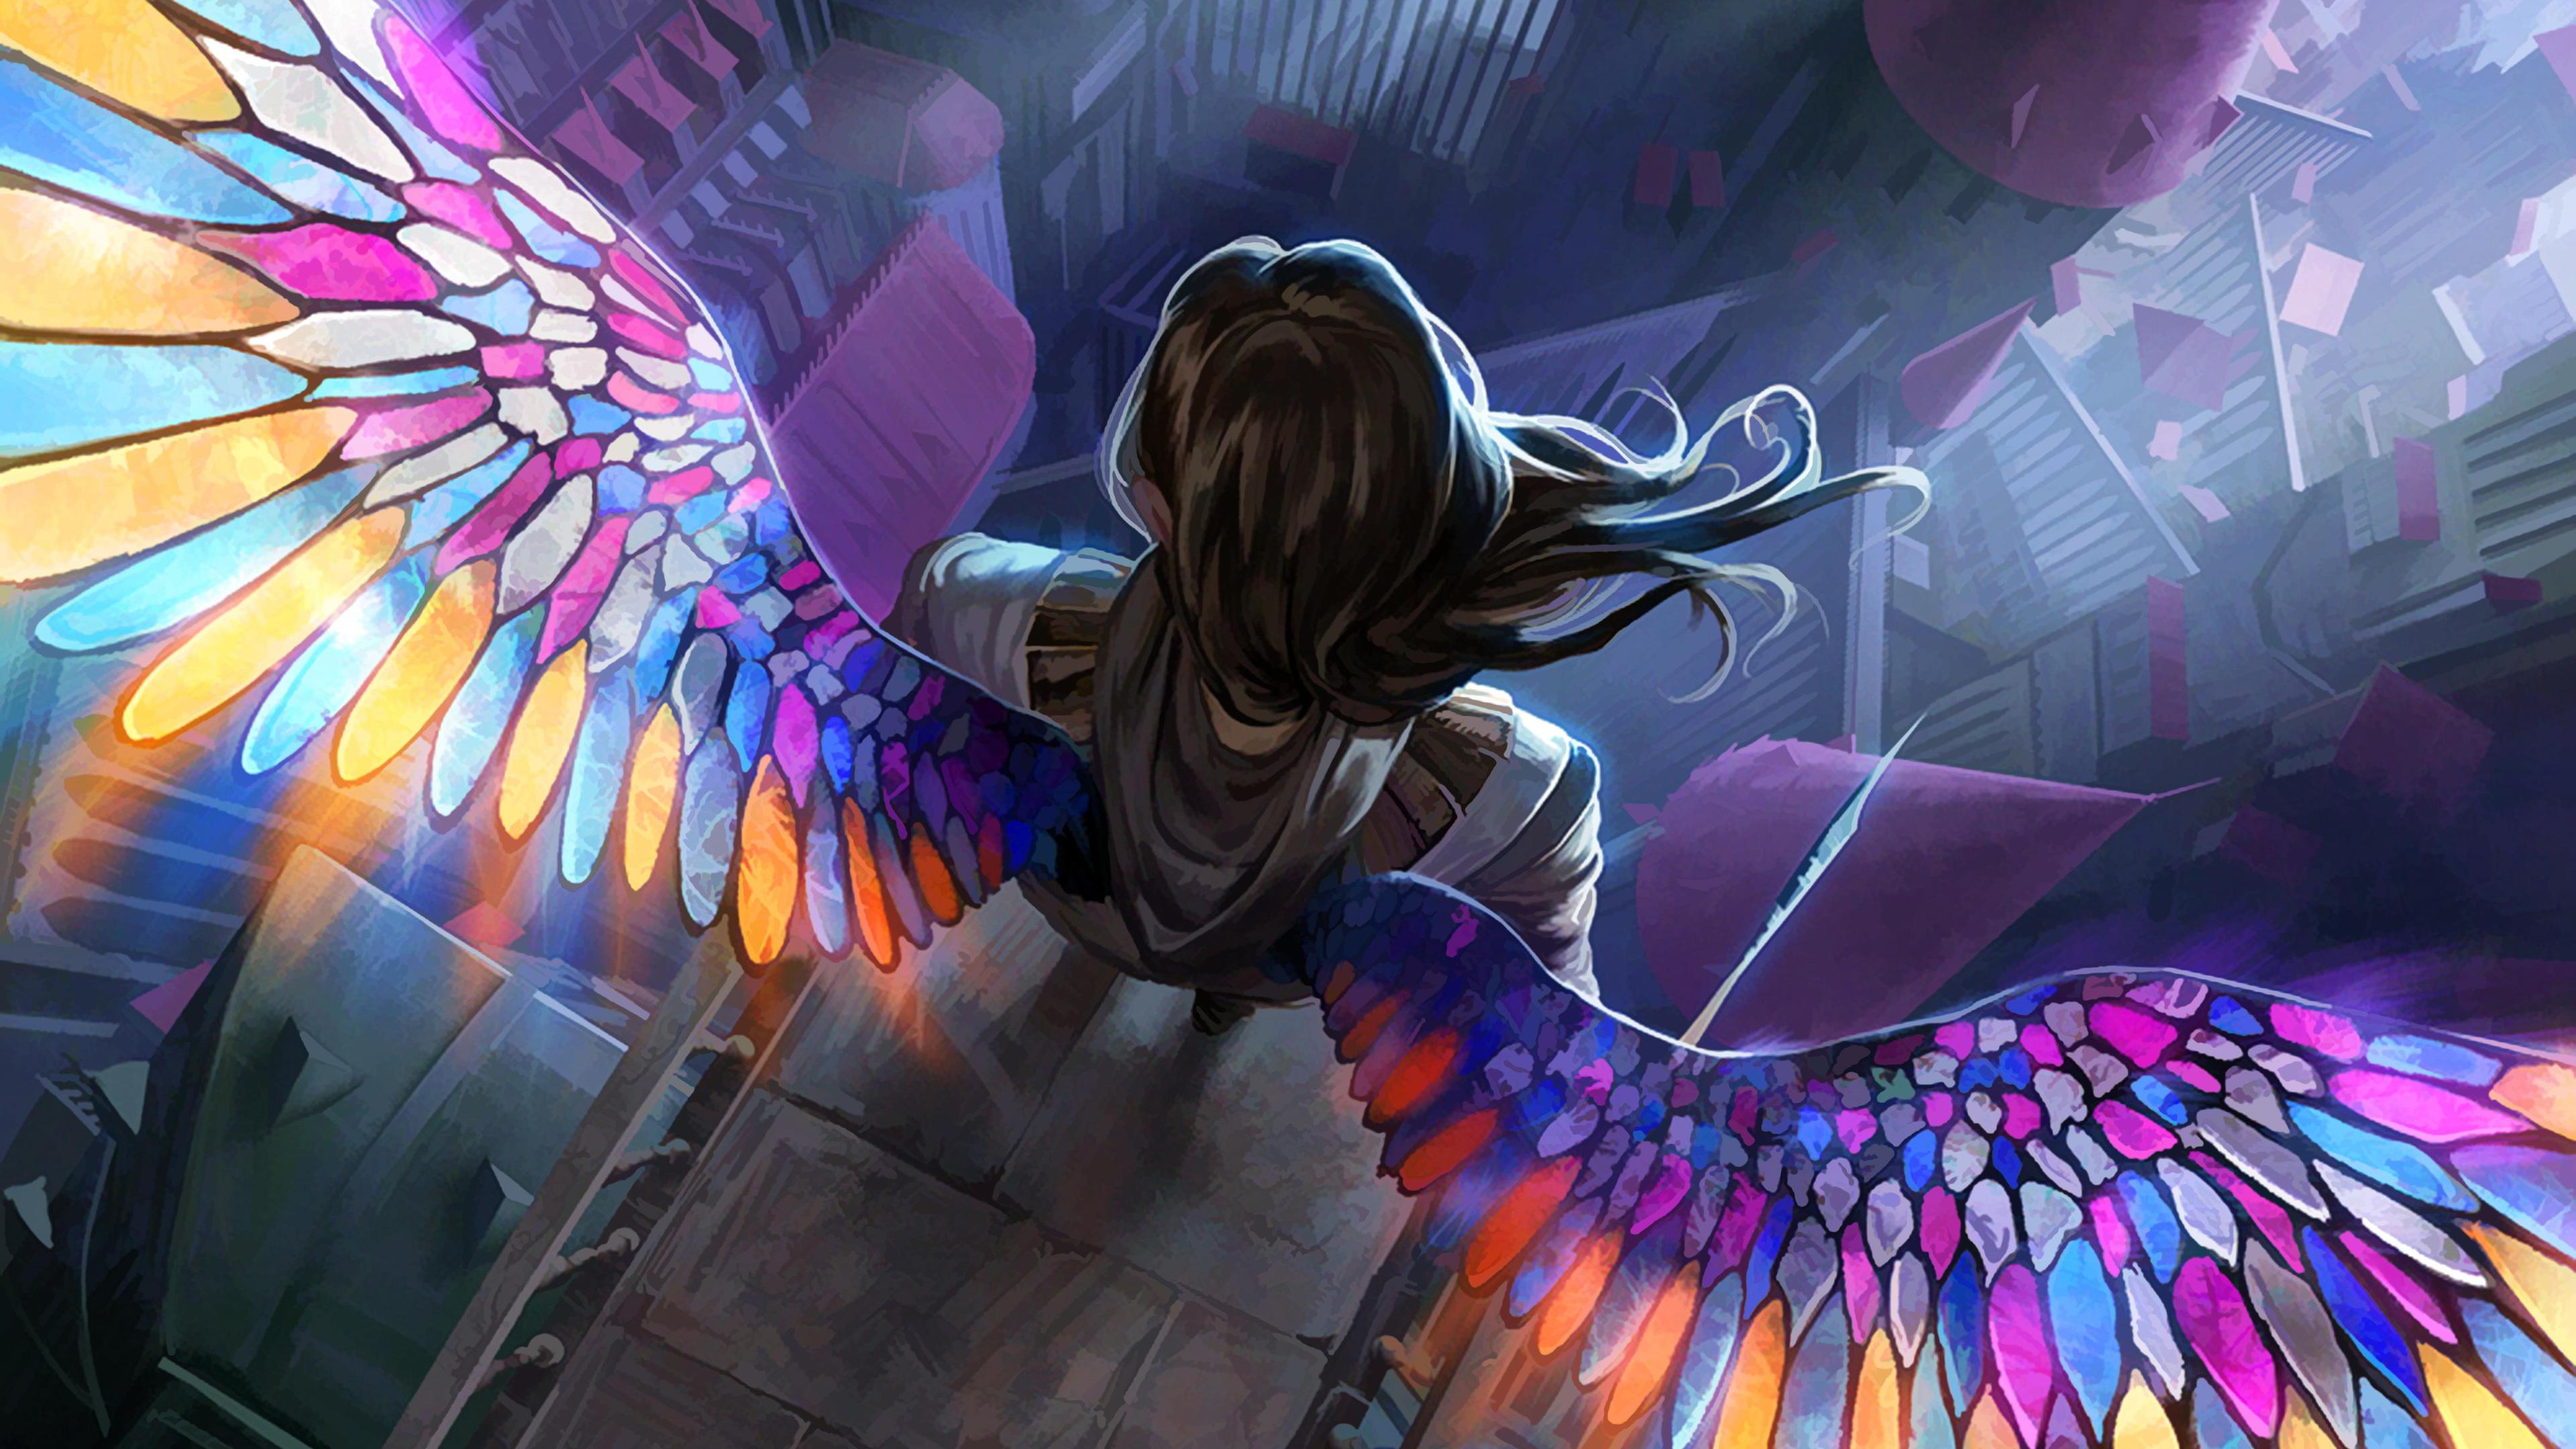 angel colorful wings 4k 1540749783 - Angel Colorful Wings 4k - wings wallpapers, hd-wallpapers, digital art wallpapers, deviantart wallpapers, colorful wallpapers, artwork wallpapers, artist wallpapers, angel wallpapers, 5k wallpapers, 4k-wallpapers